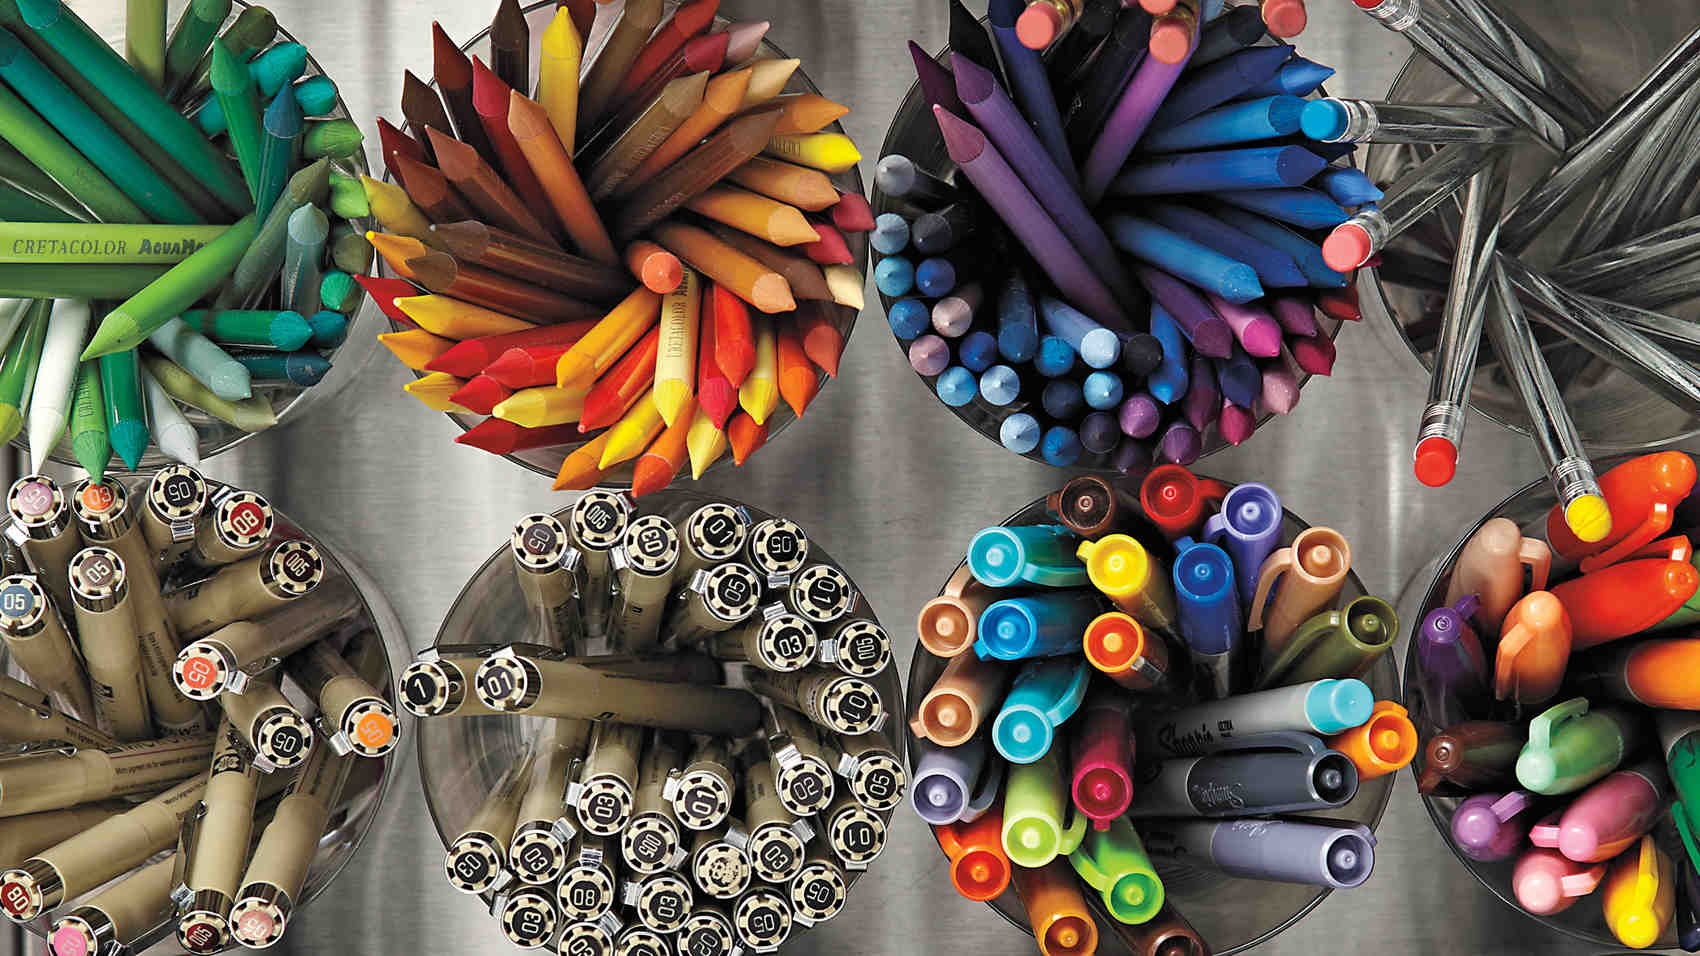 Encourage Creativity Through Design